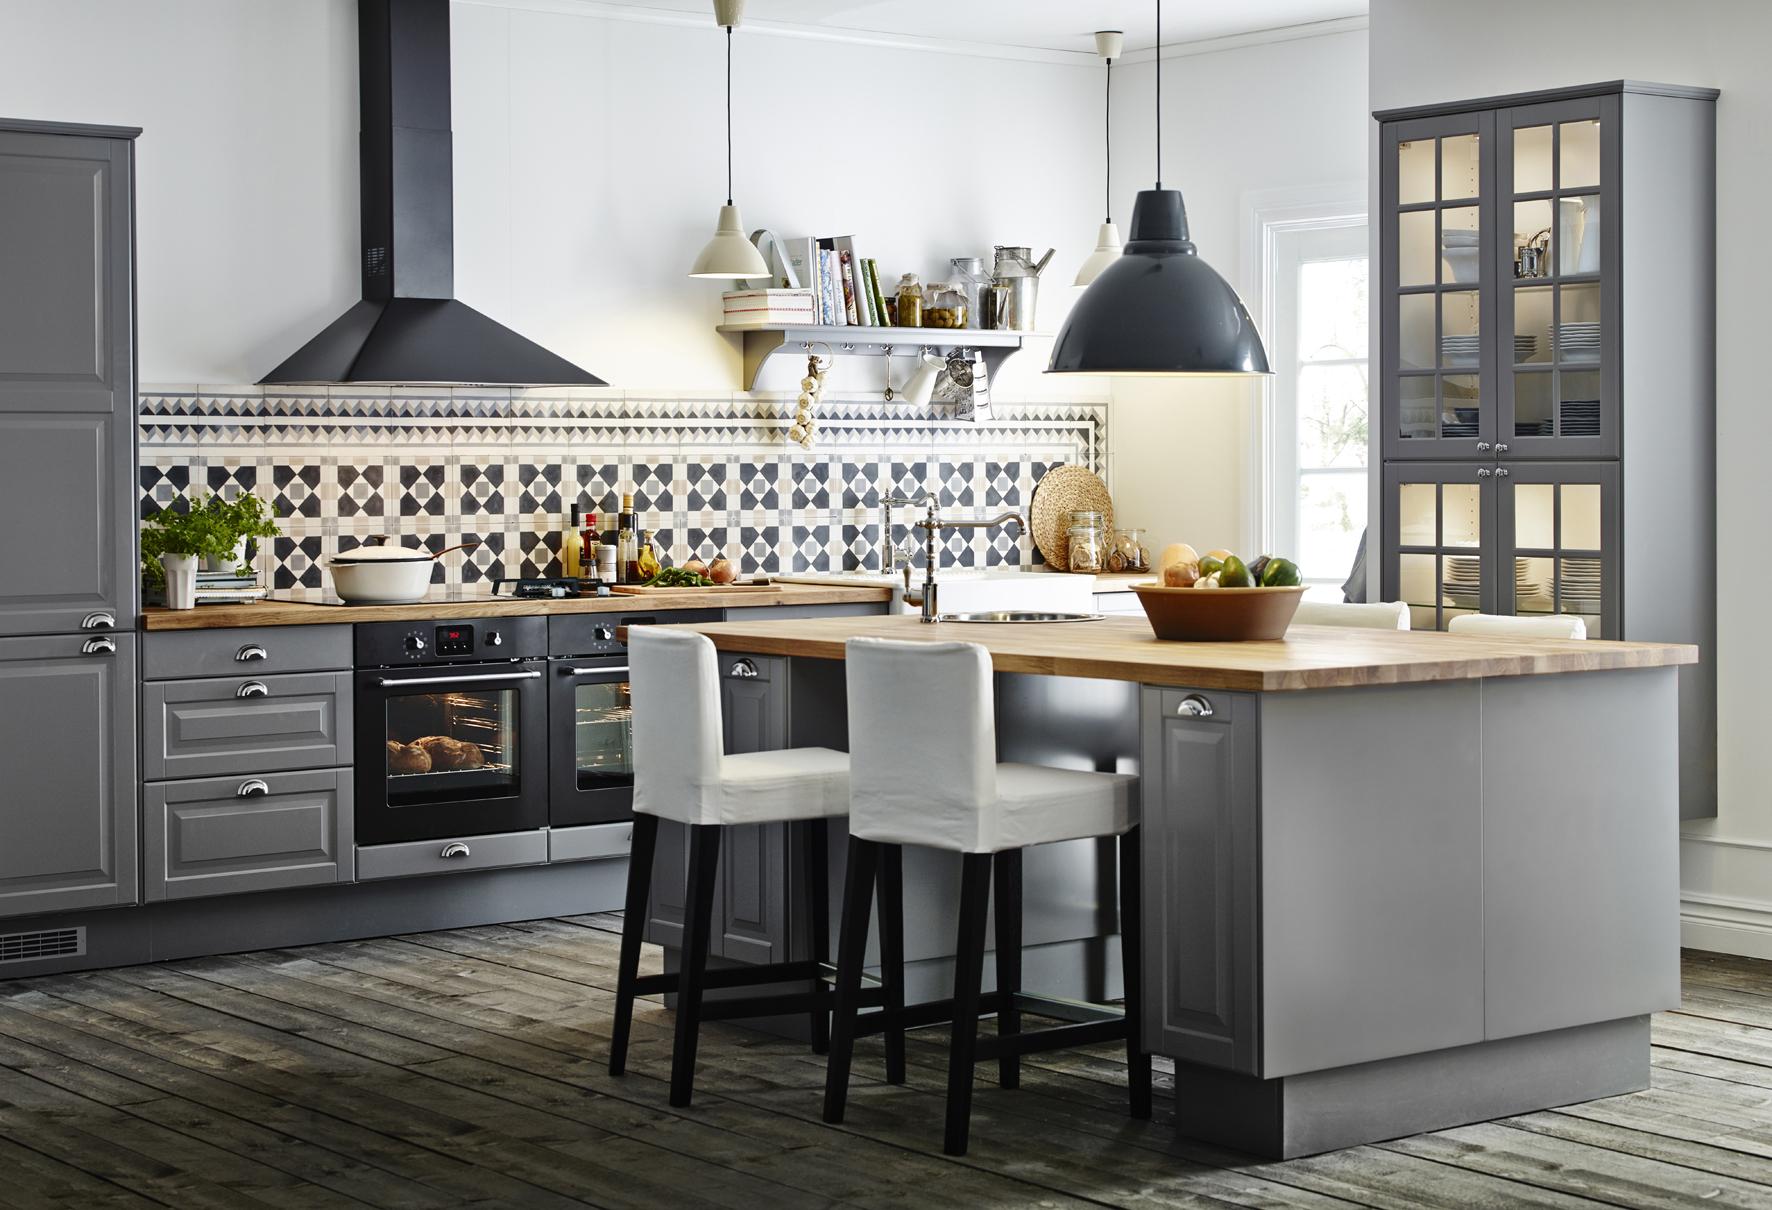 Mooie korting op ikea keukens faktum nieuws startpagina voor keuken idee n uw - Keuken deur lapeyre ...